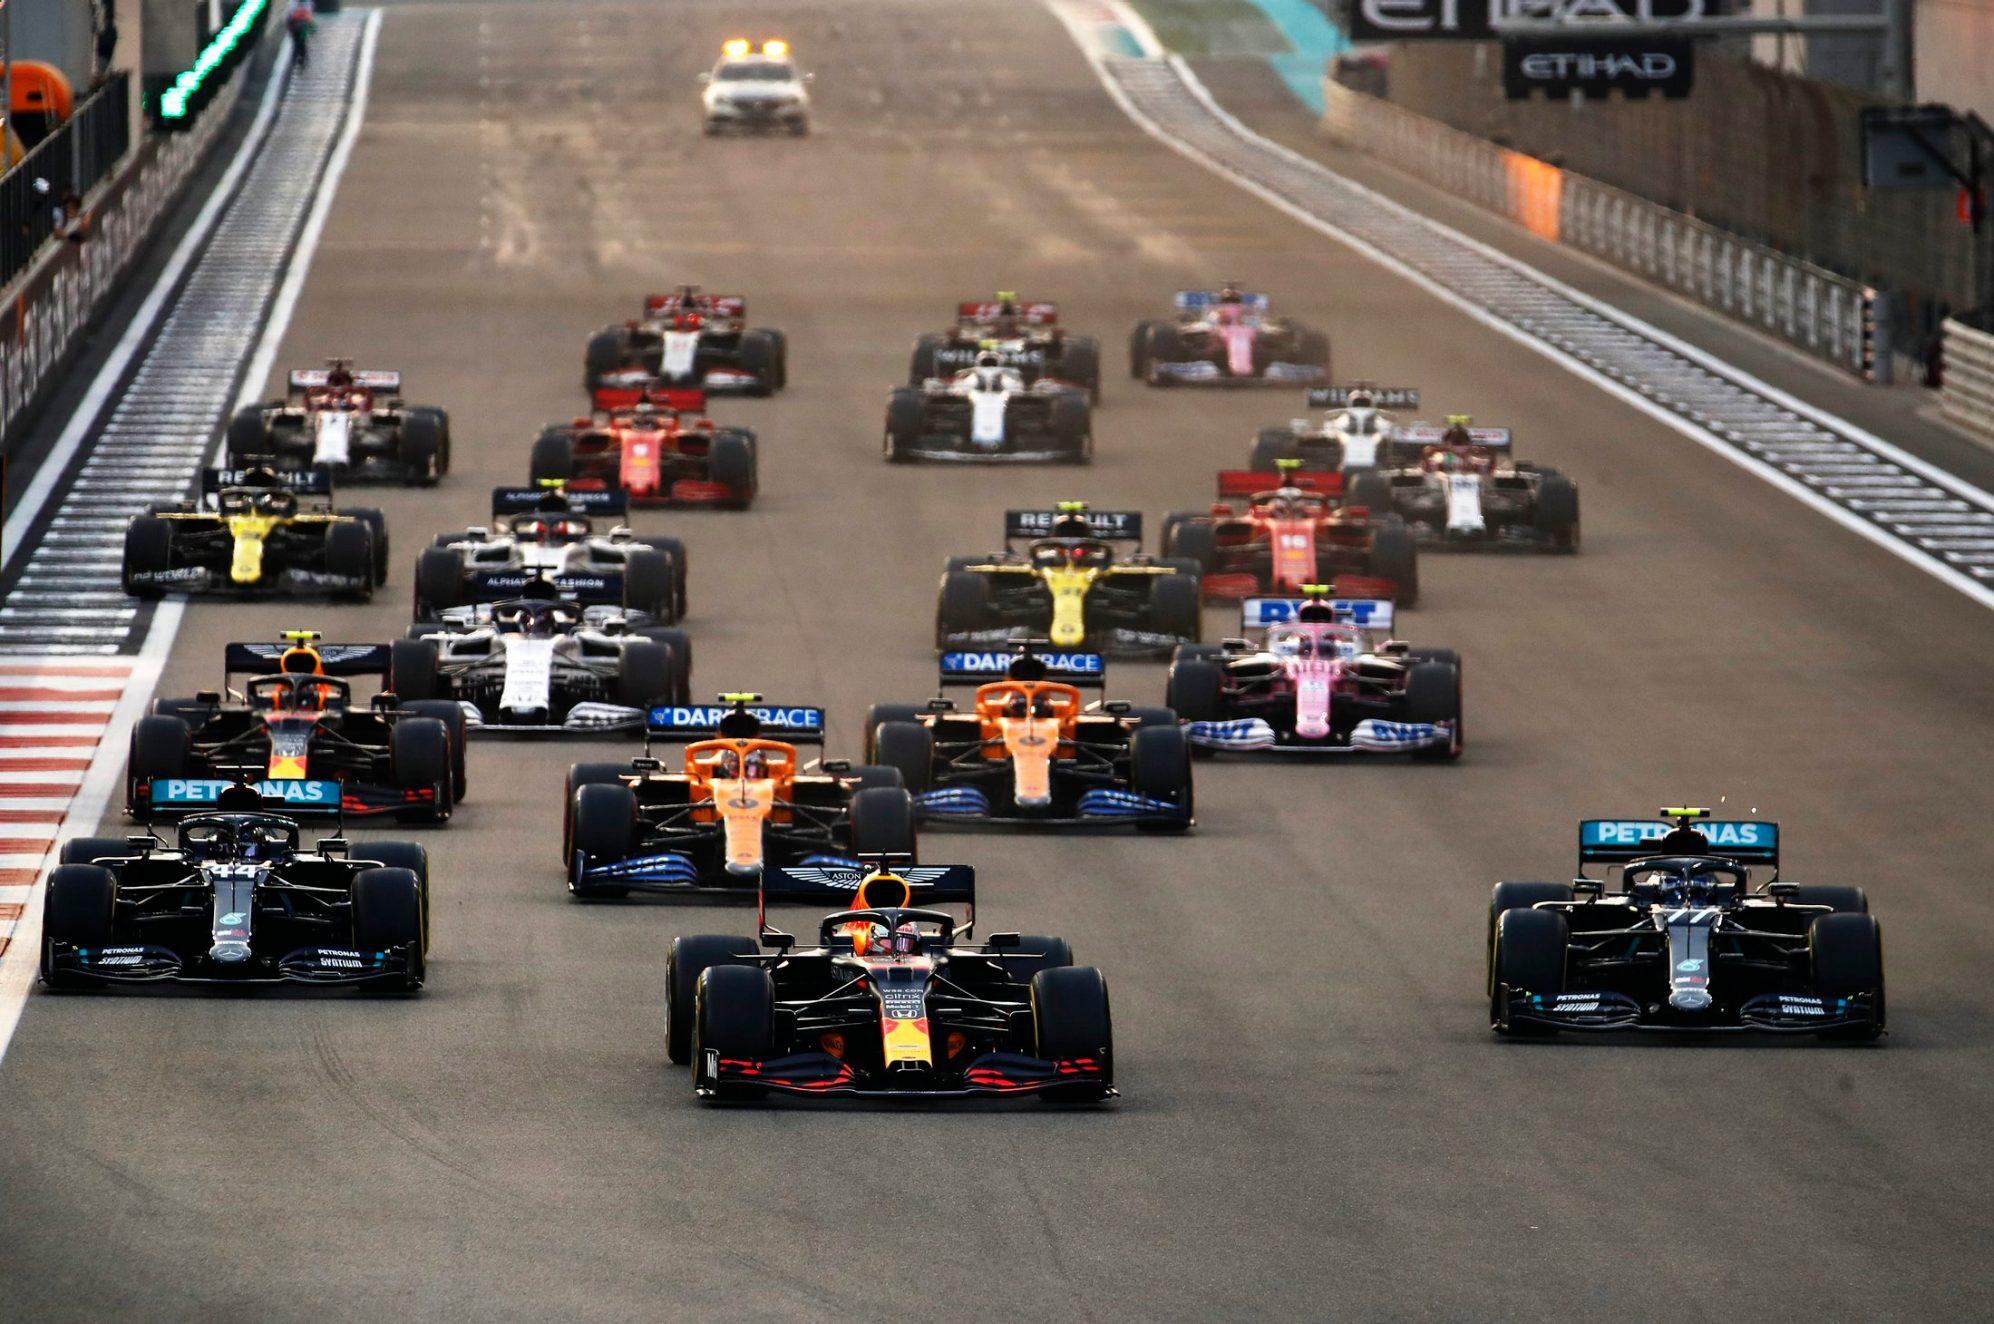 Bahrain Replaces Australia As 2021 F1 Season Opener - Automacha